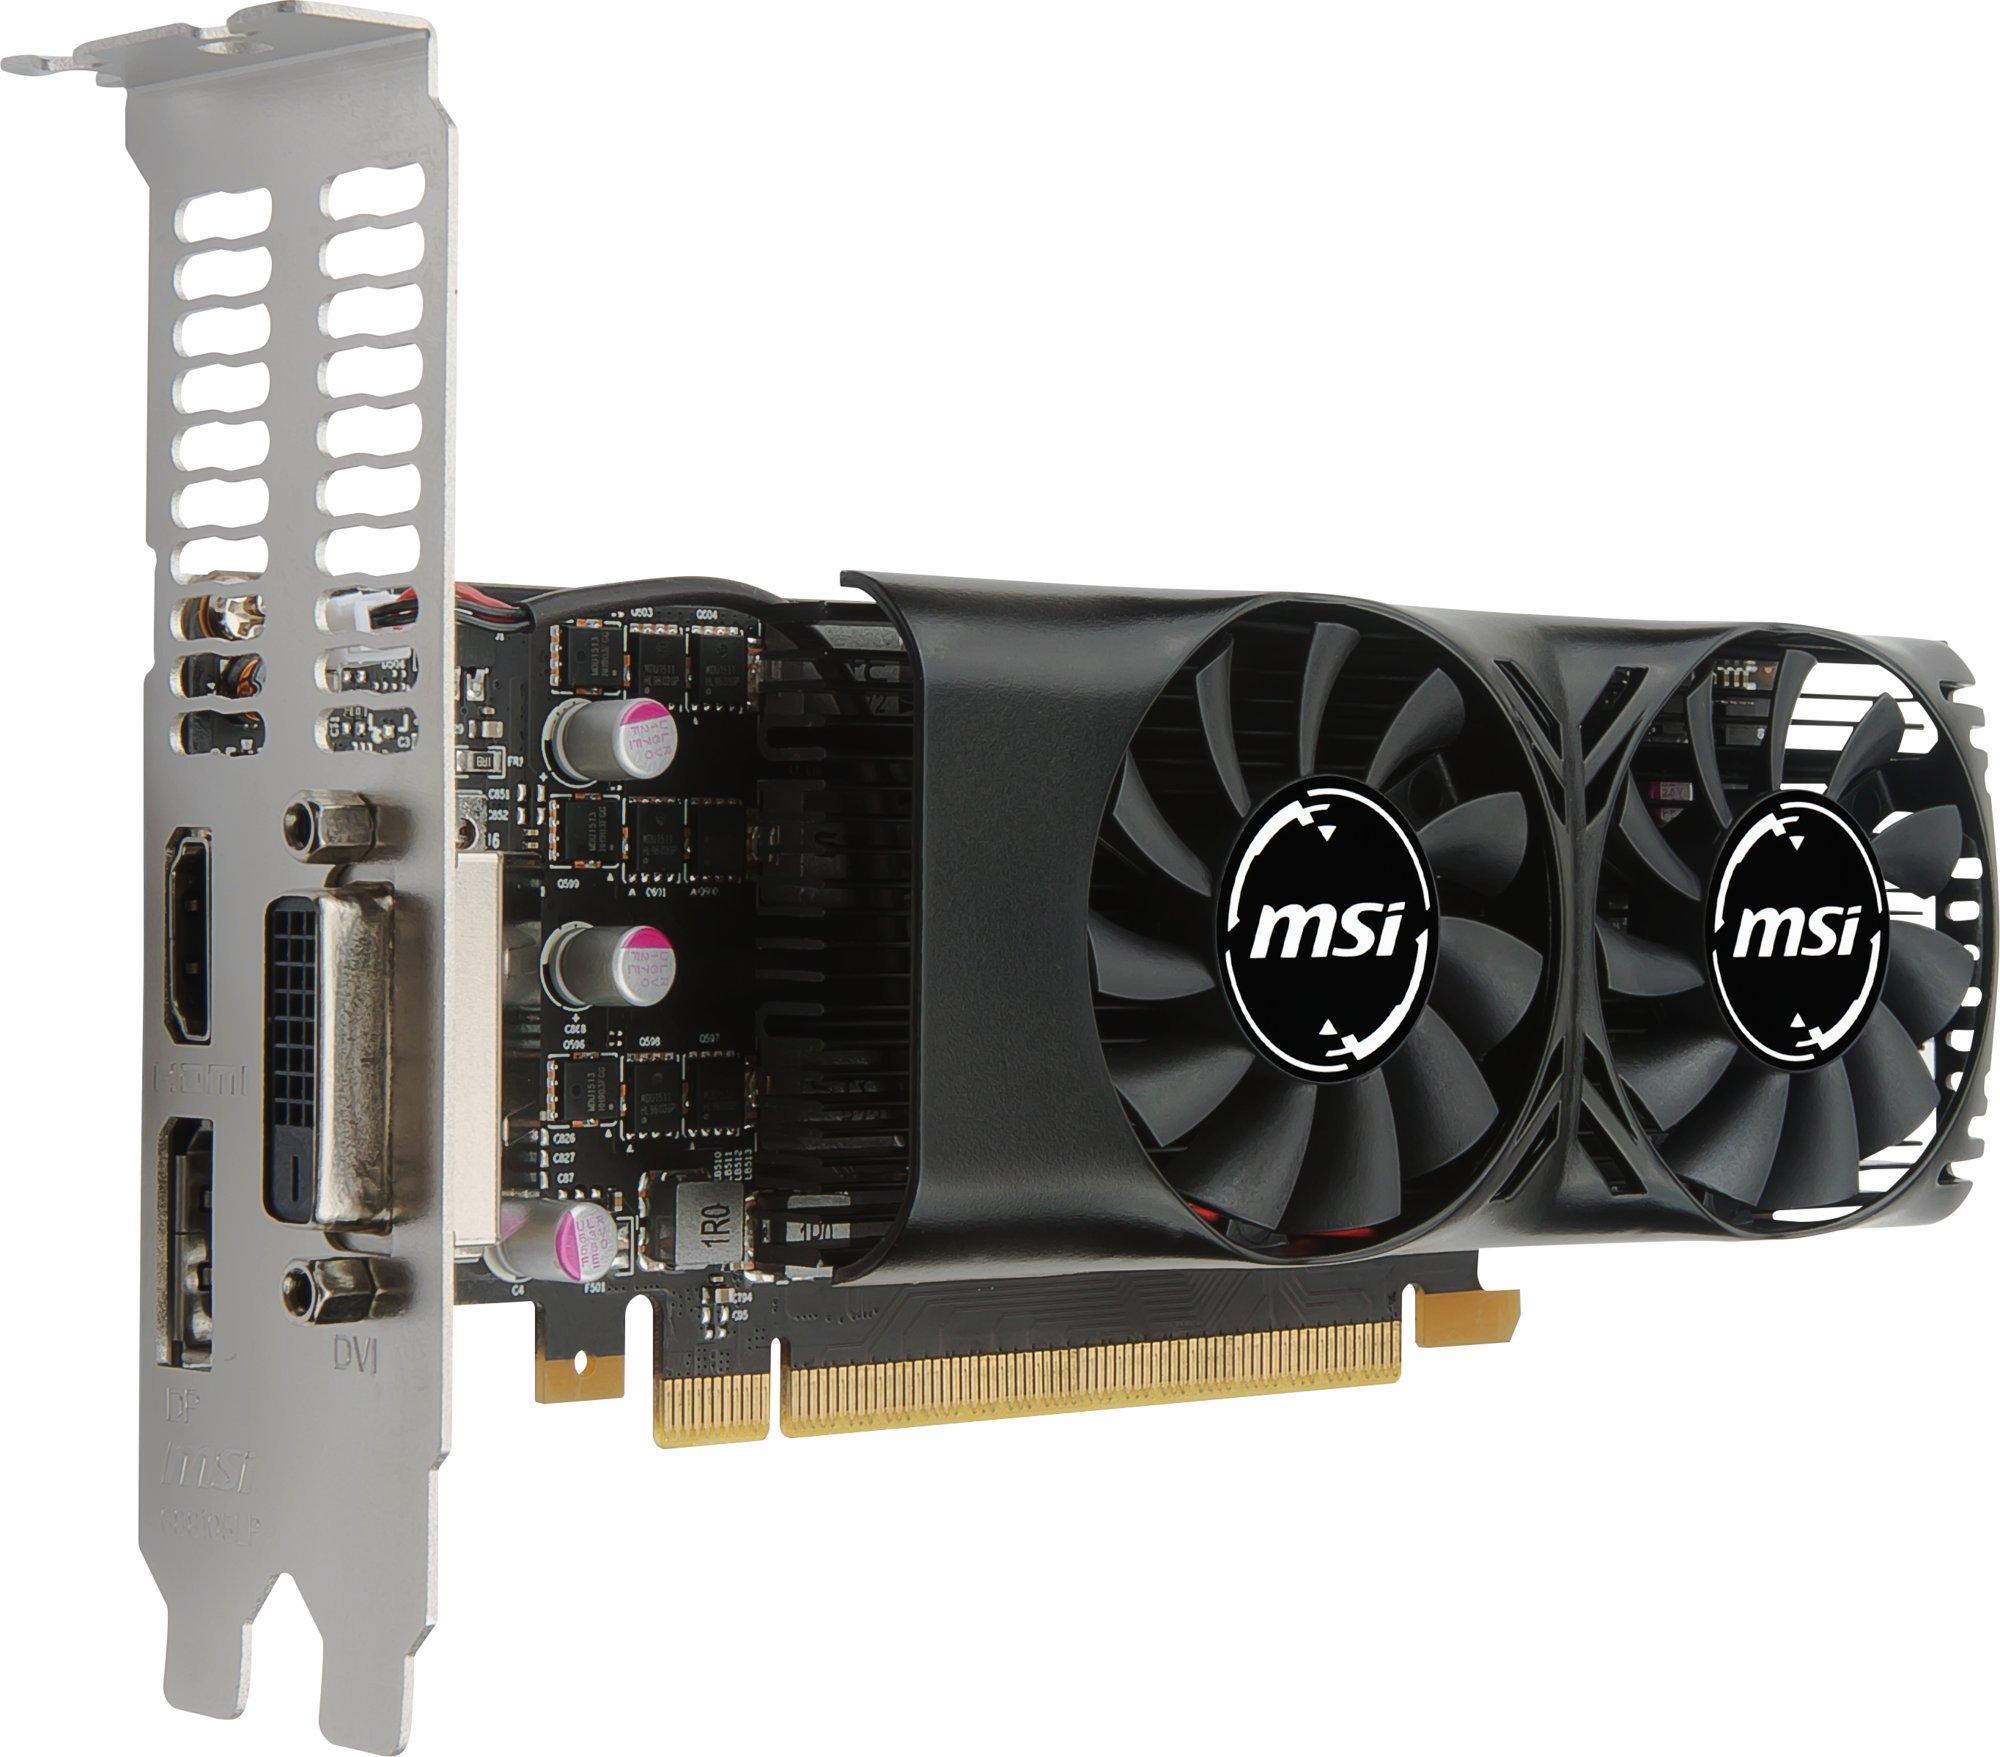 MSI Nvidia Geforce GTX 1050 2GB GDDR5